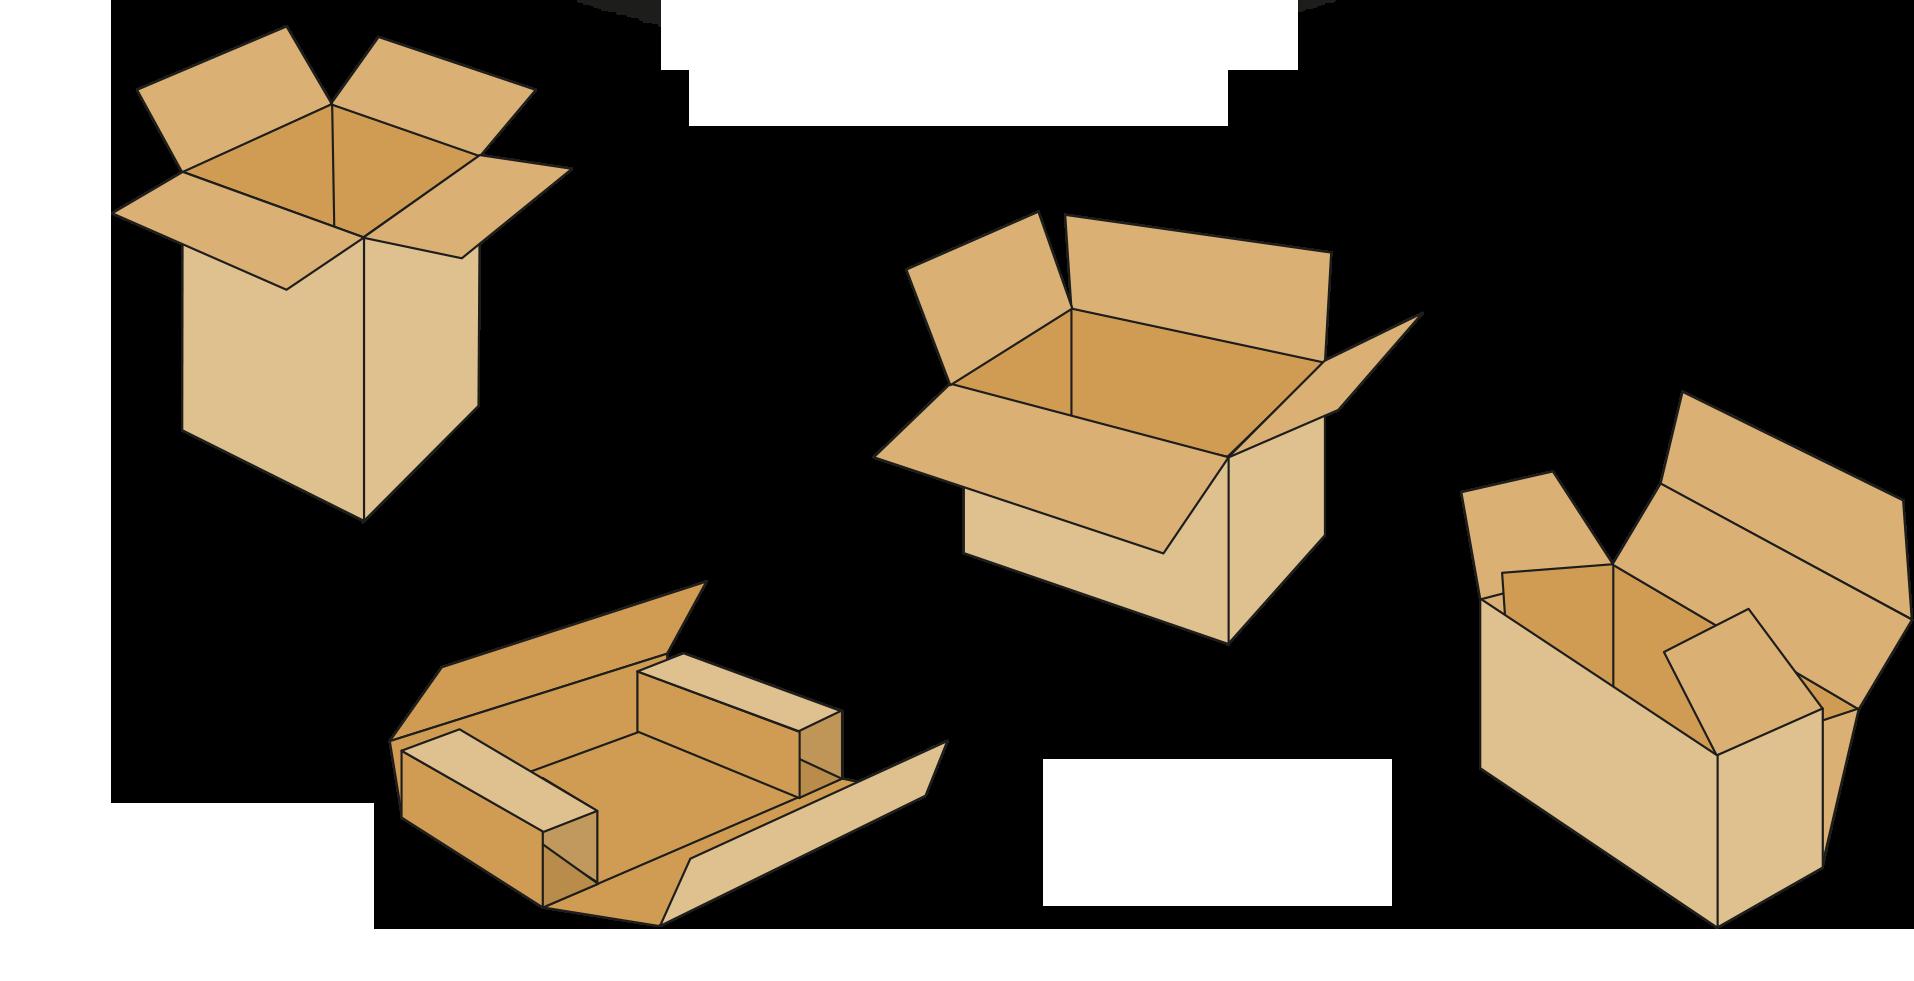 box_on_demand2